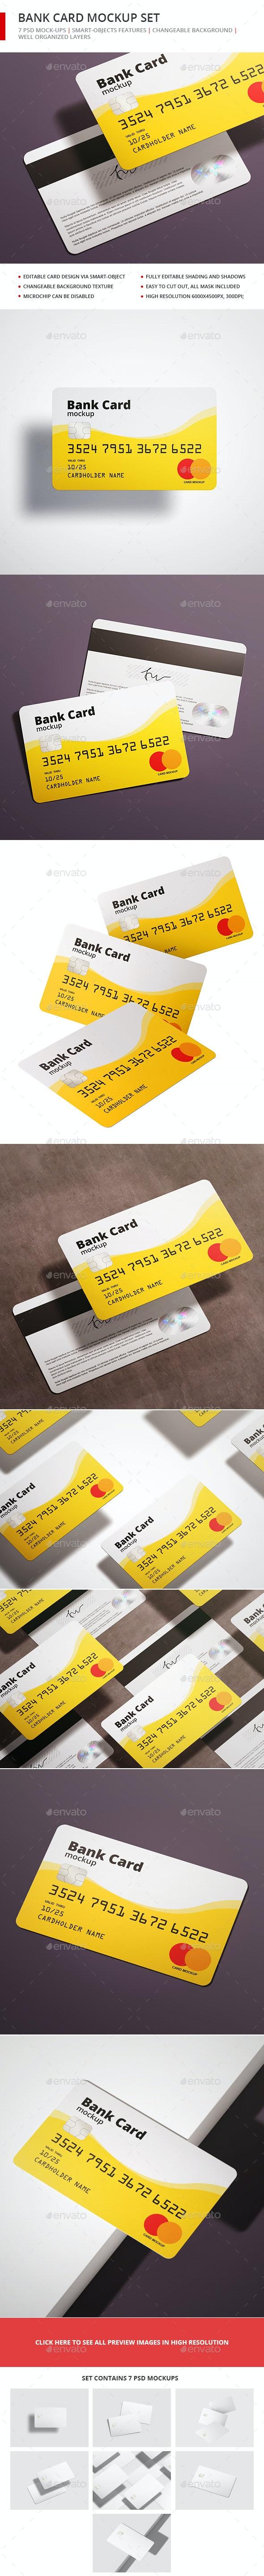 Bank Card / Membership Card Mockup - Business Cards Print